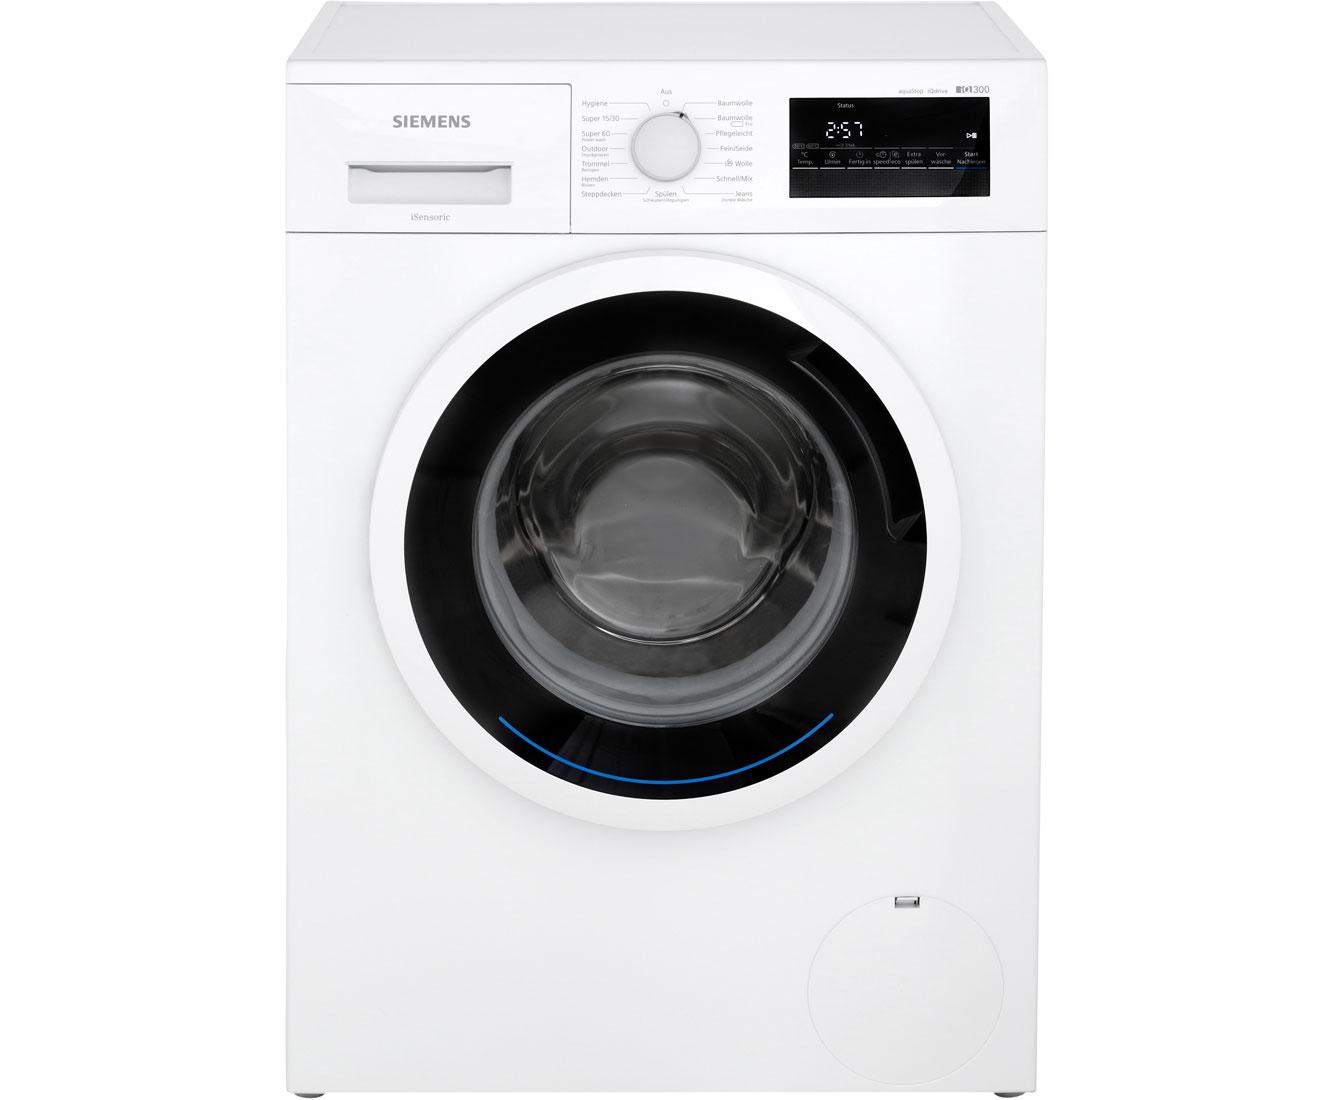 Siemens iq wm n waschmaschine kg u min a